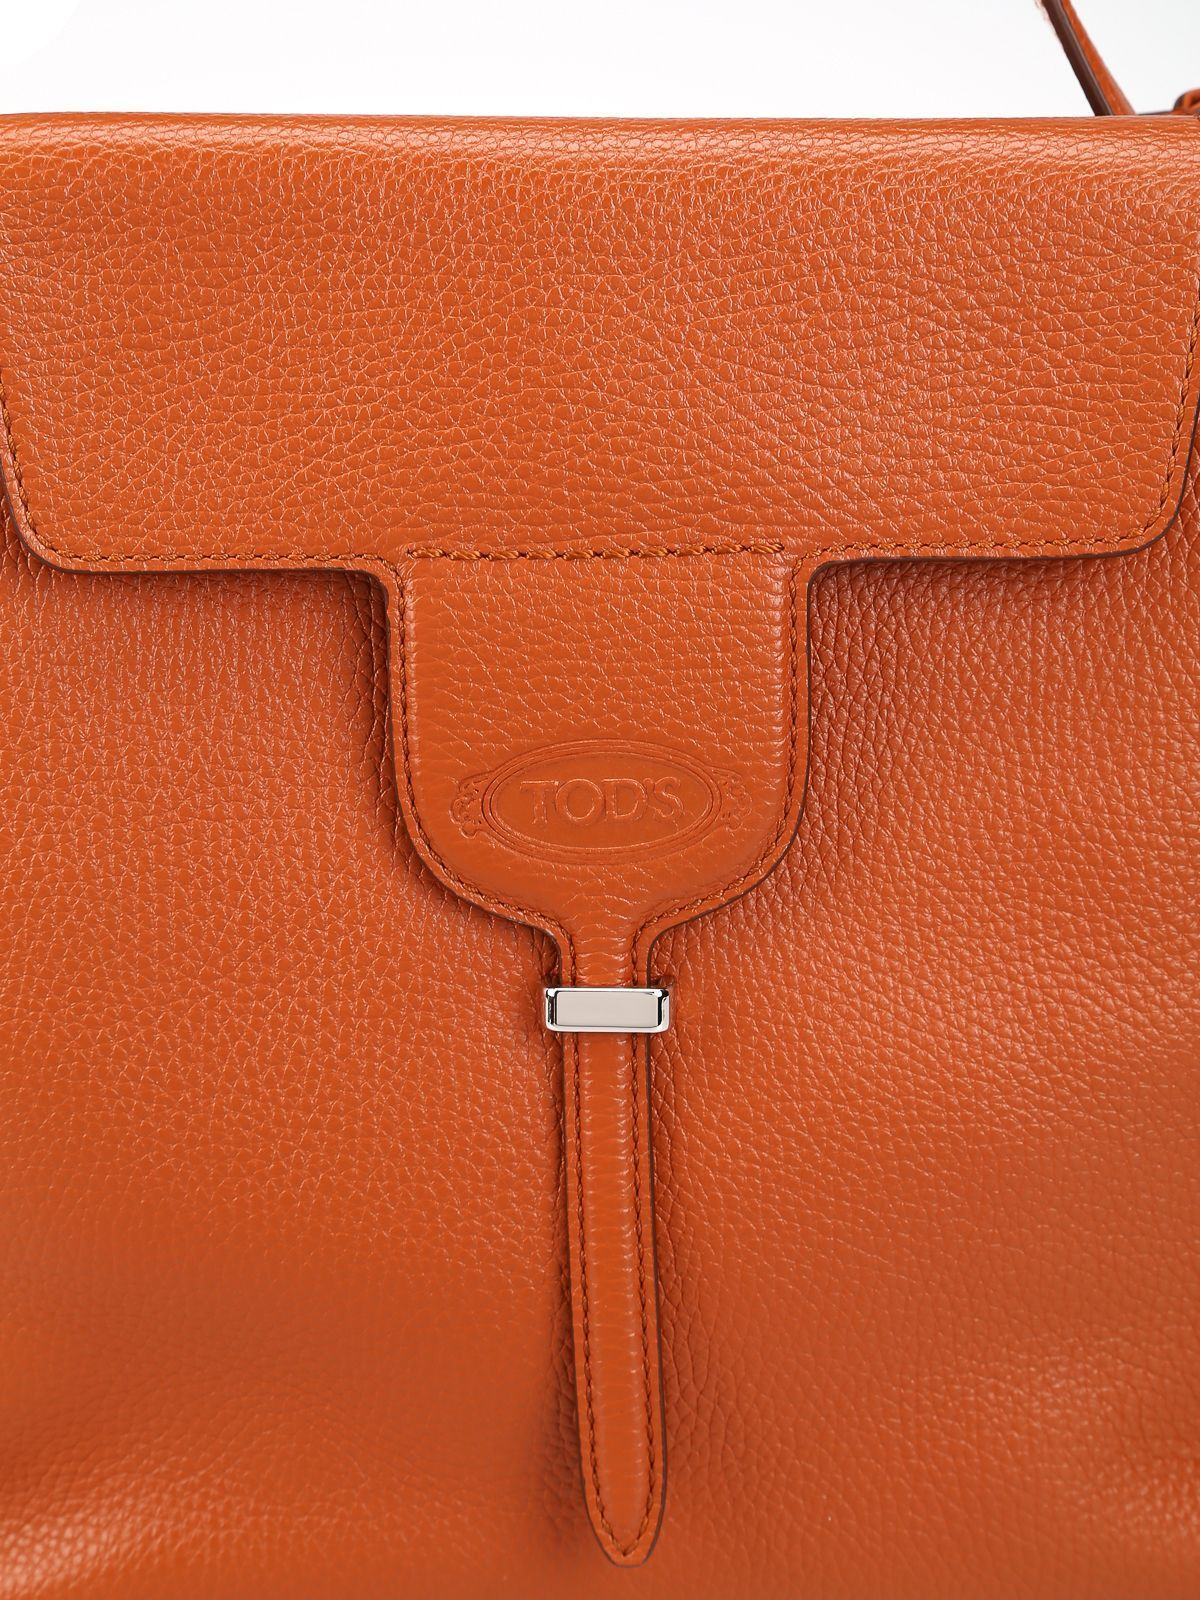 TOD'S WOMEN'S XBWANXE9200FFXG807 ORANGE LEATHER SHOULDER BAG